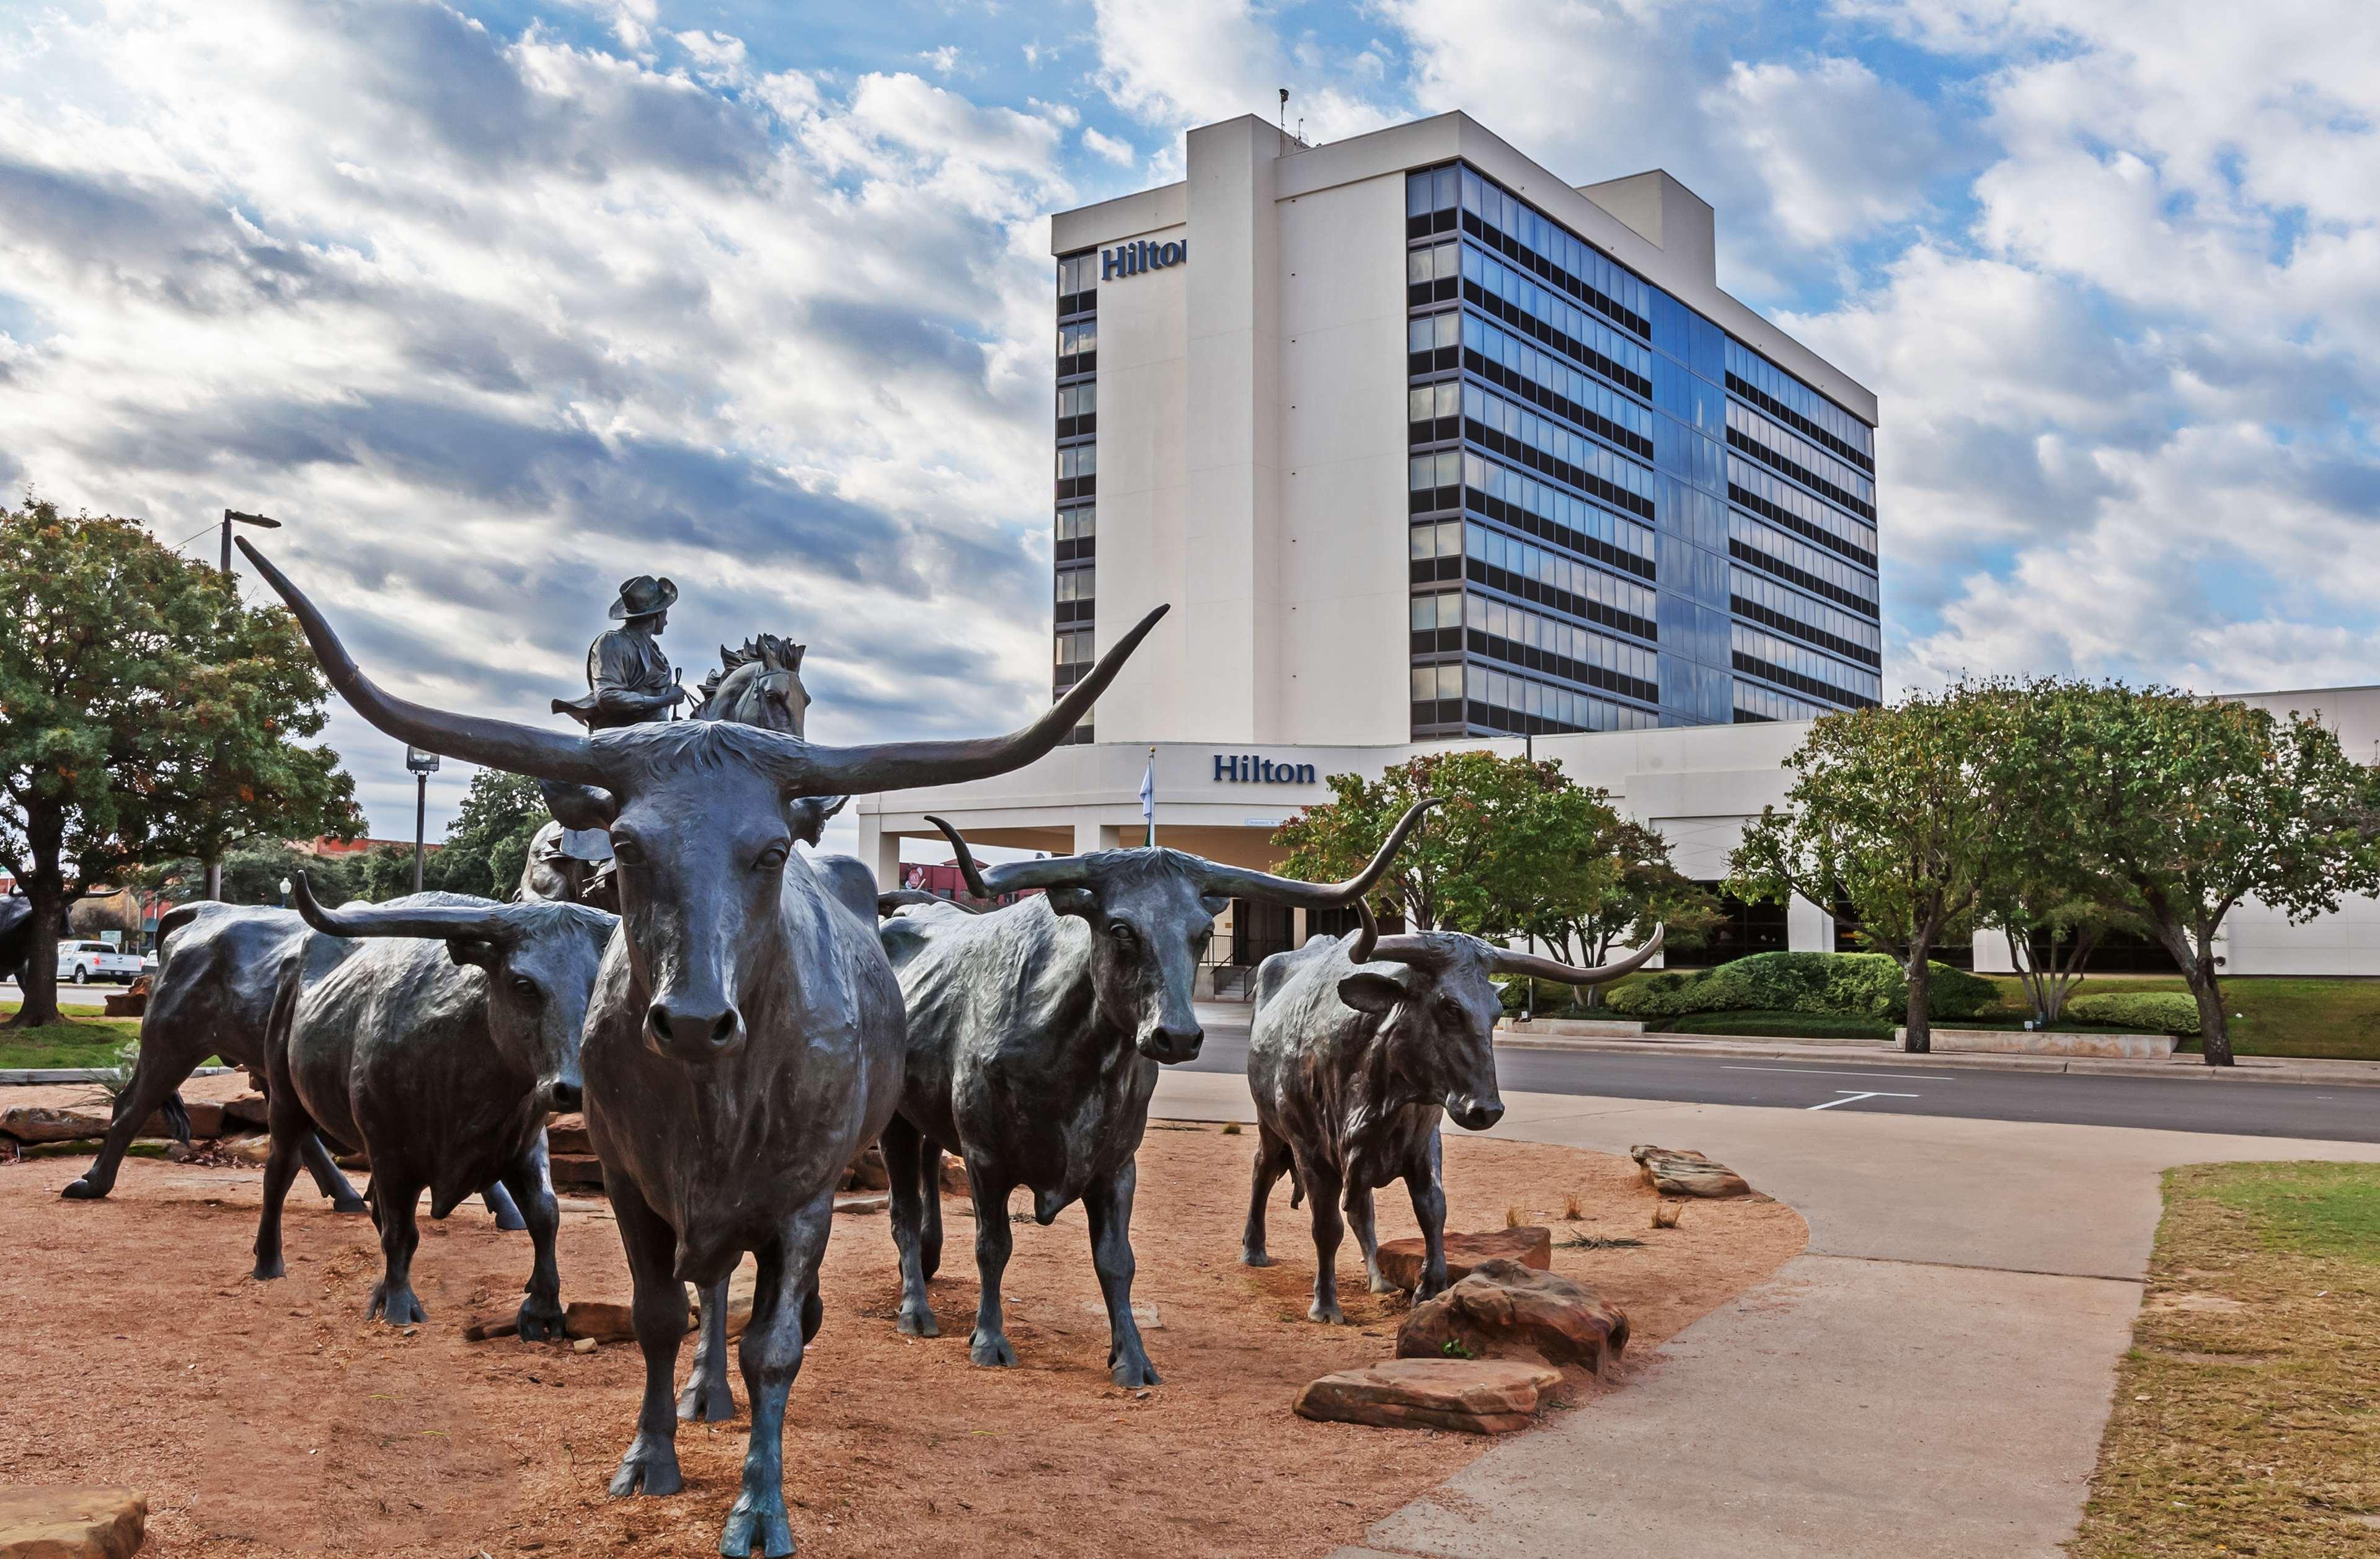 Hilton Waco image 9